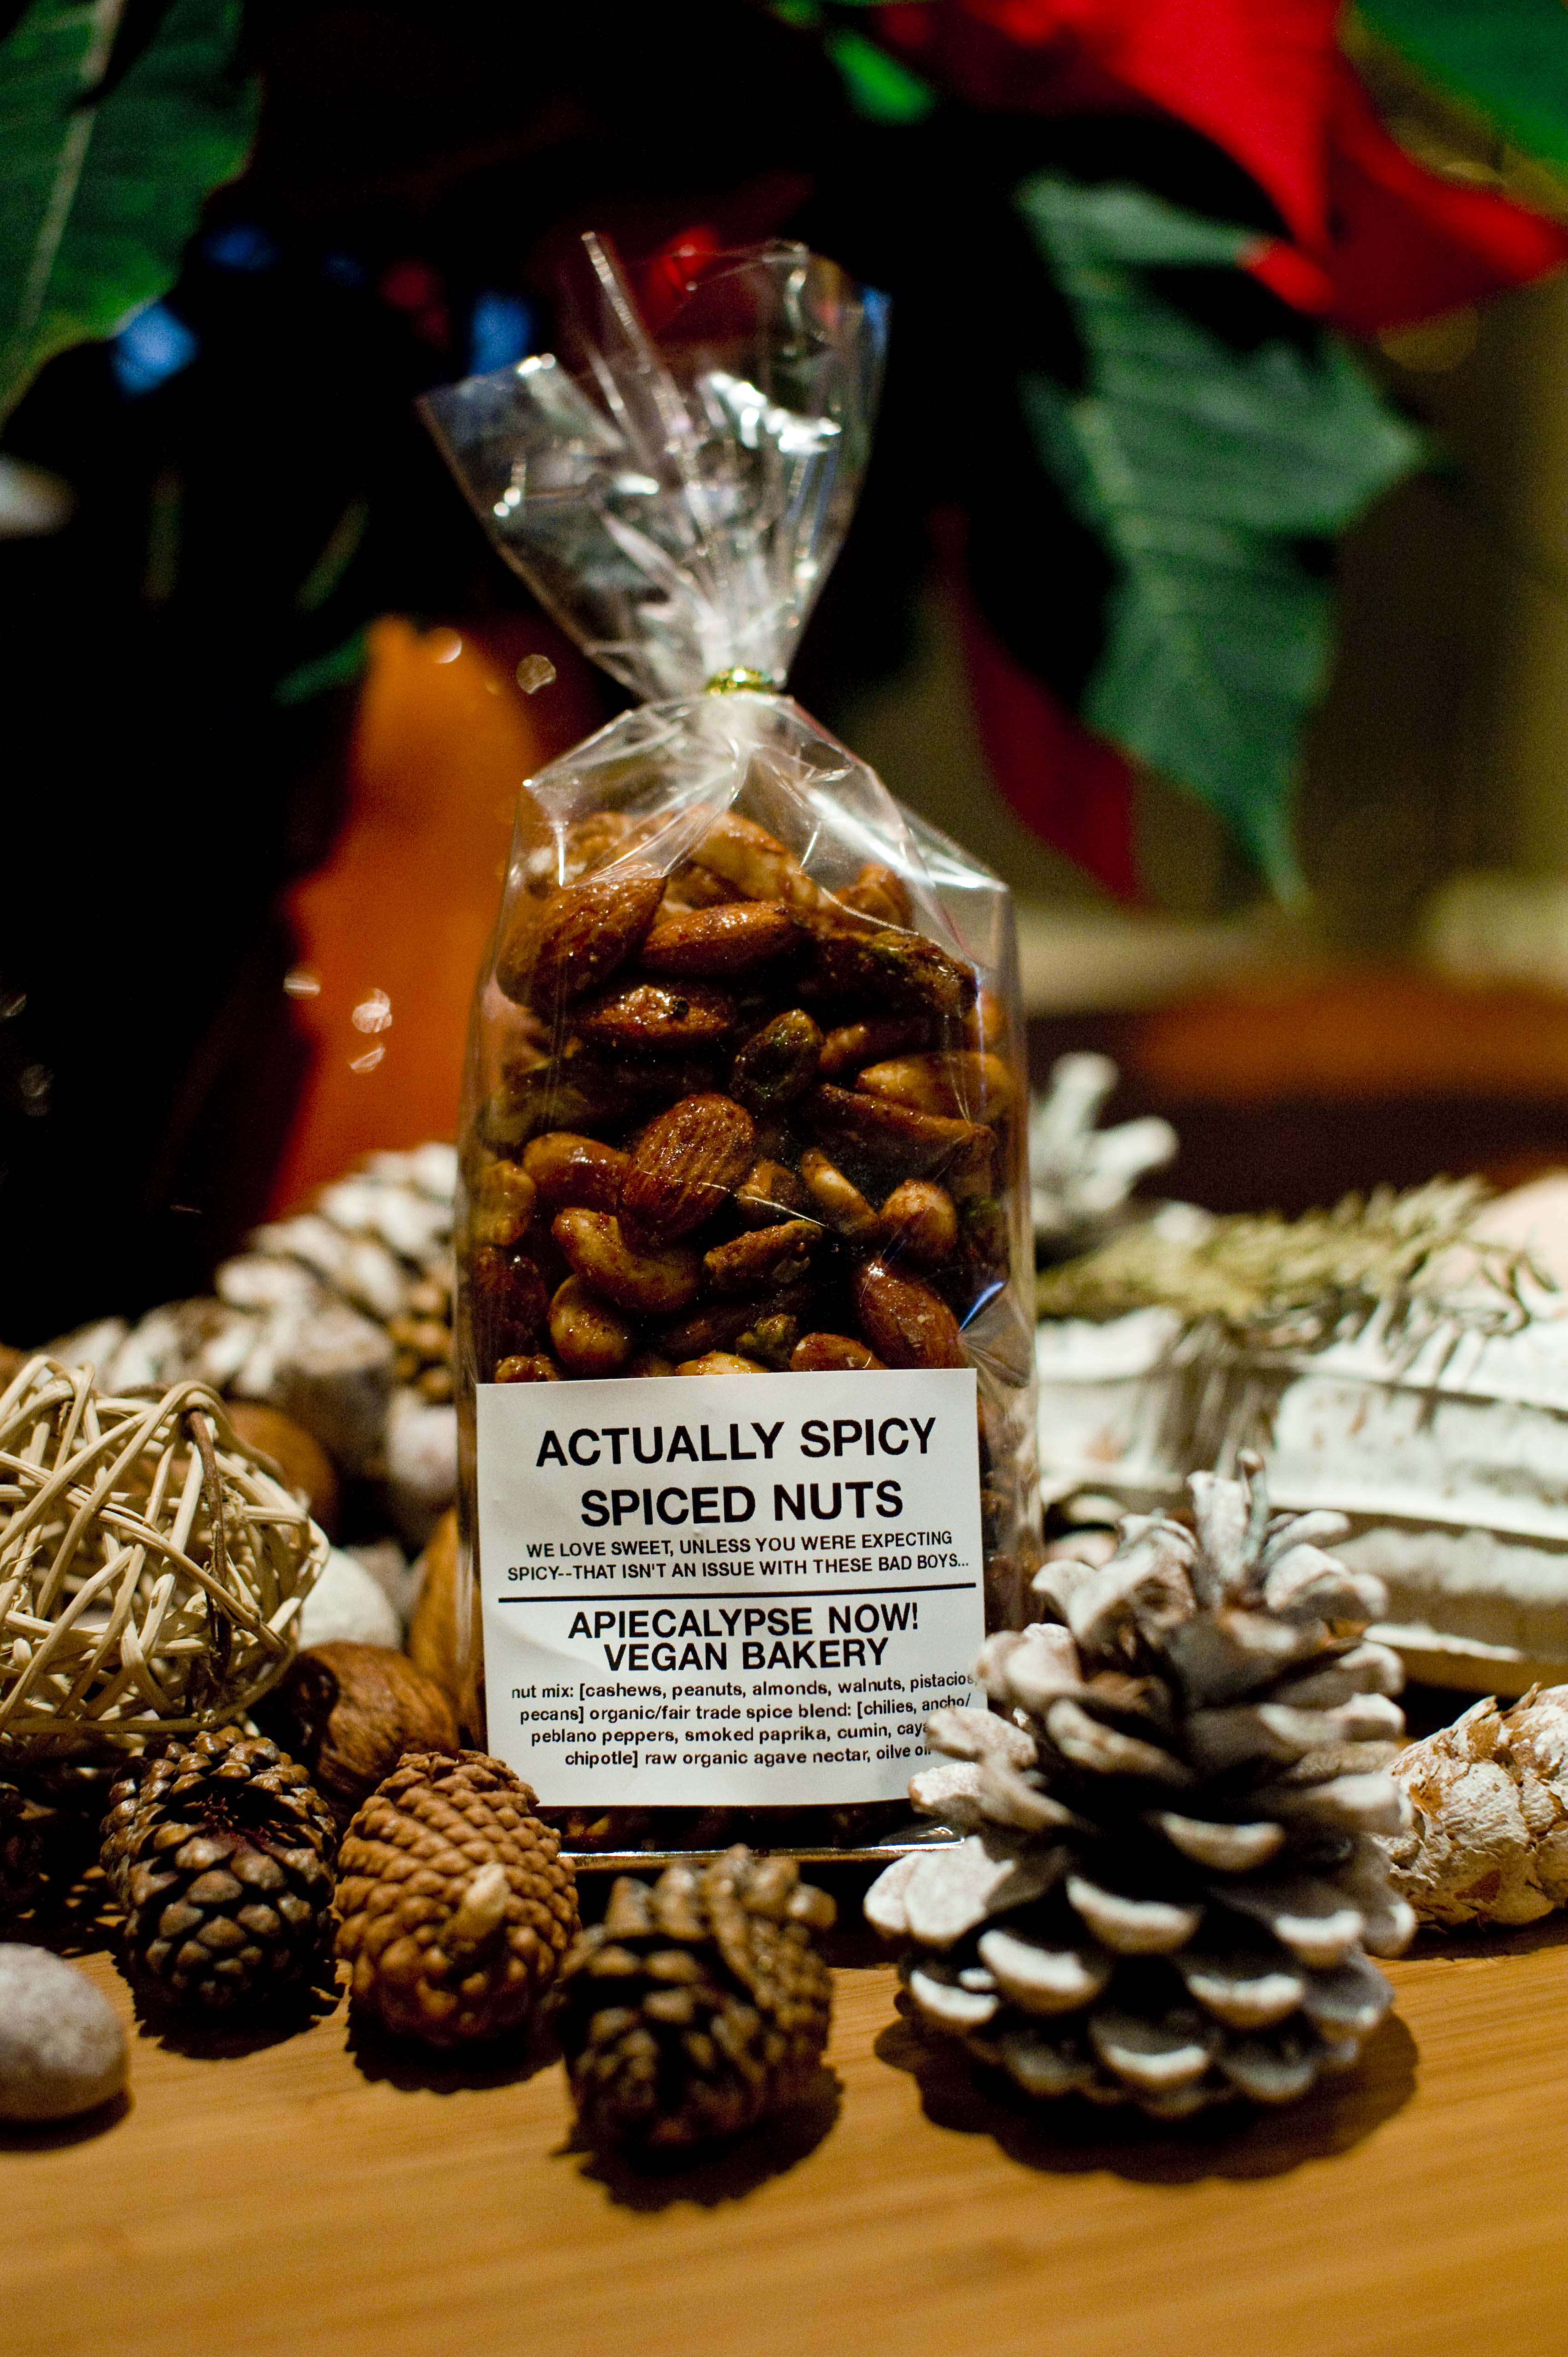 Gift Baskets Toronto Pick Up : Apiecalypse now vegan bakery all holiday gift